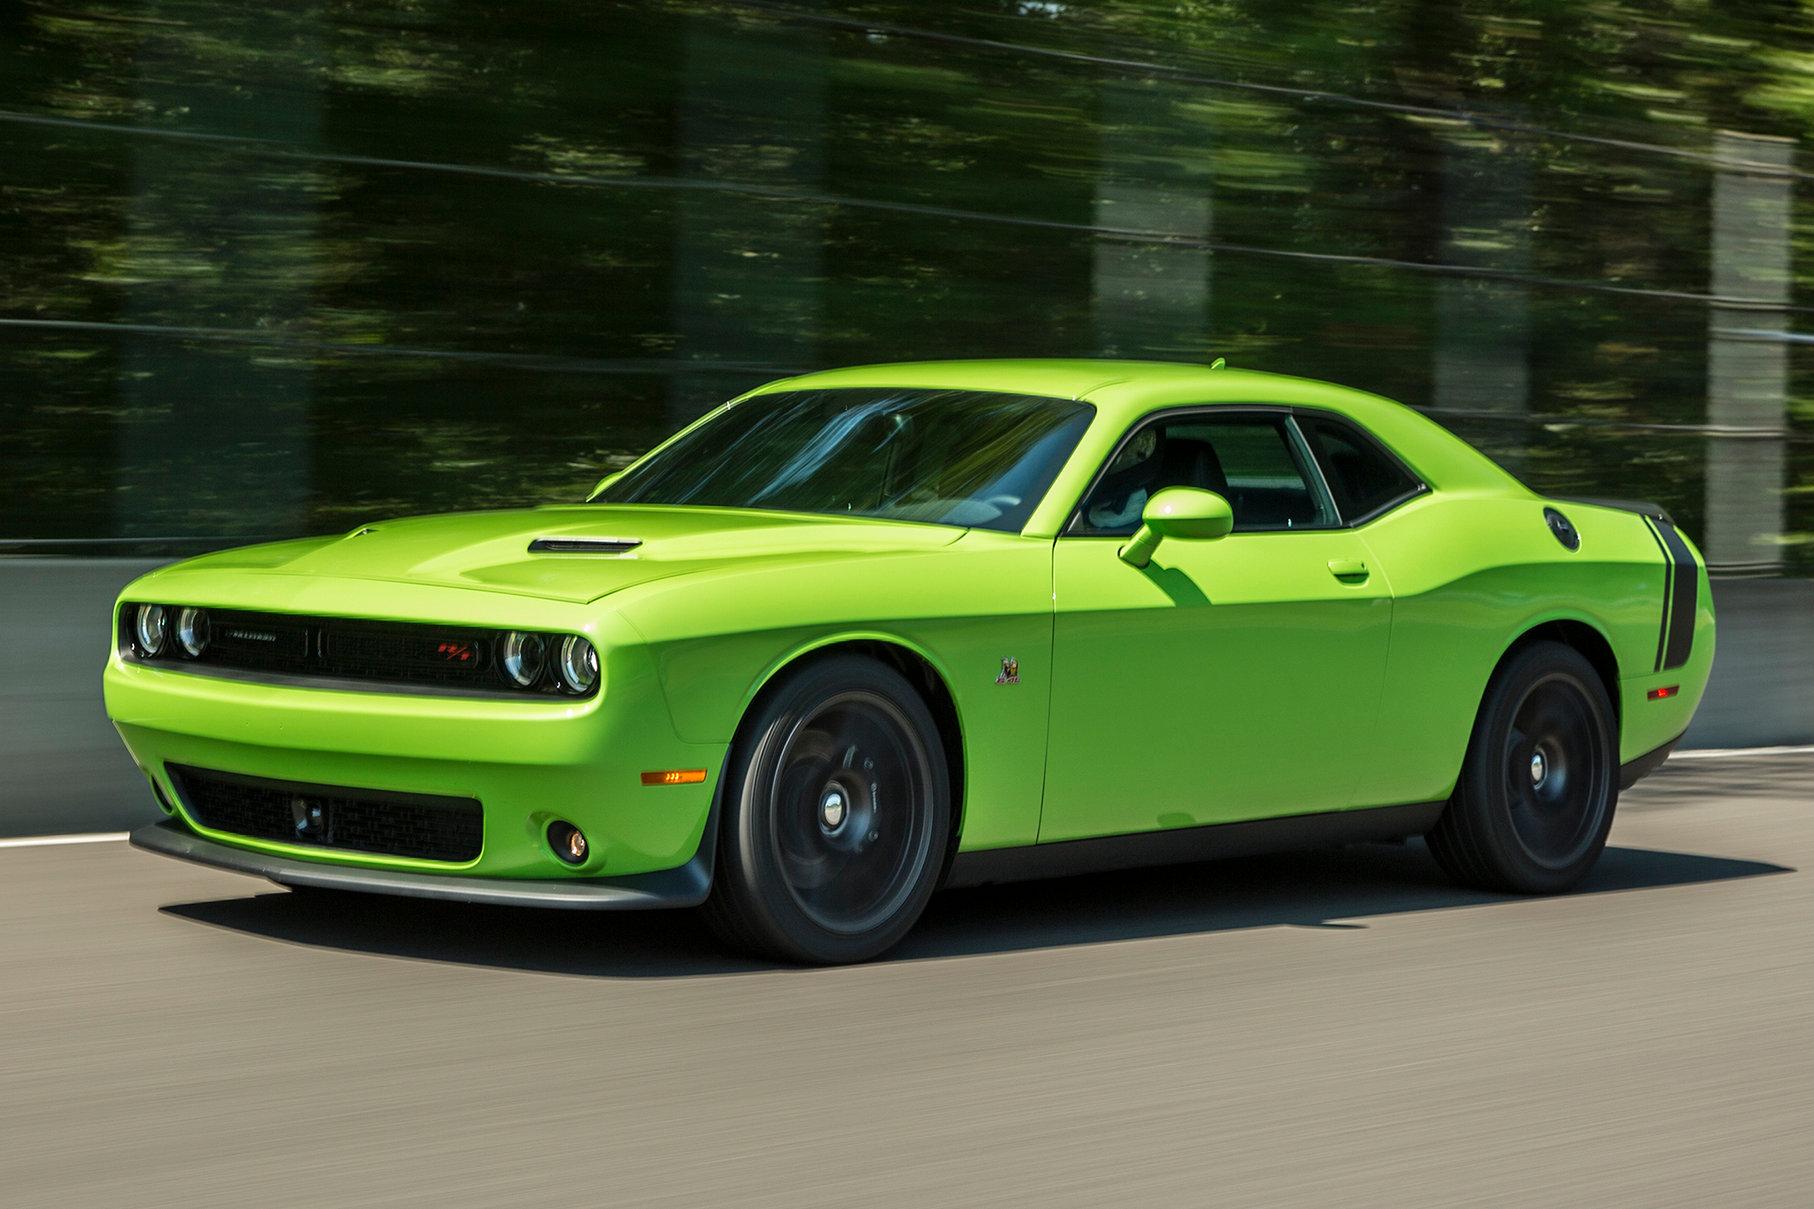 Bick Skruth Drives The Dodge Challenger Hellcat Autoblopnik